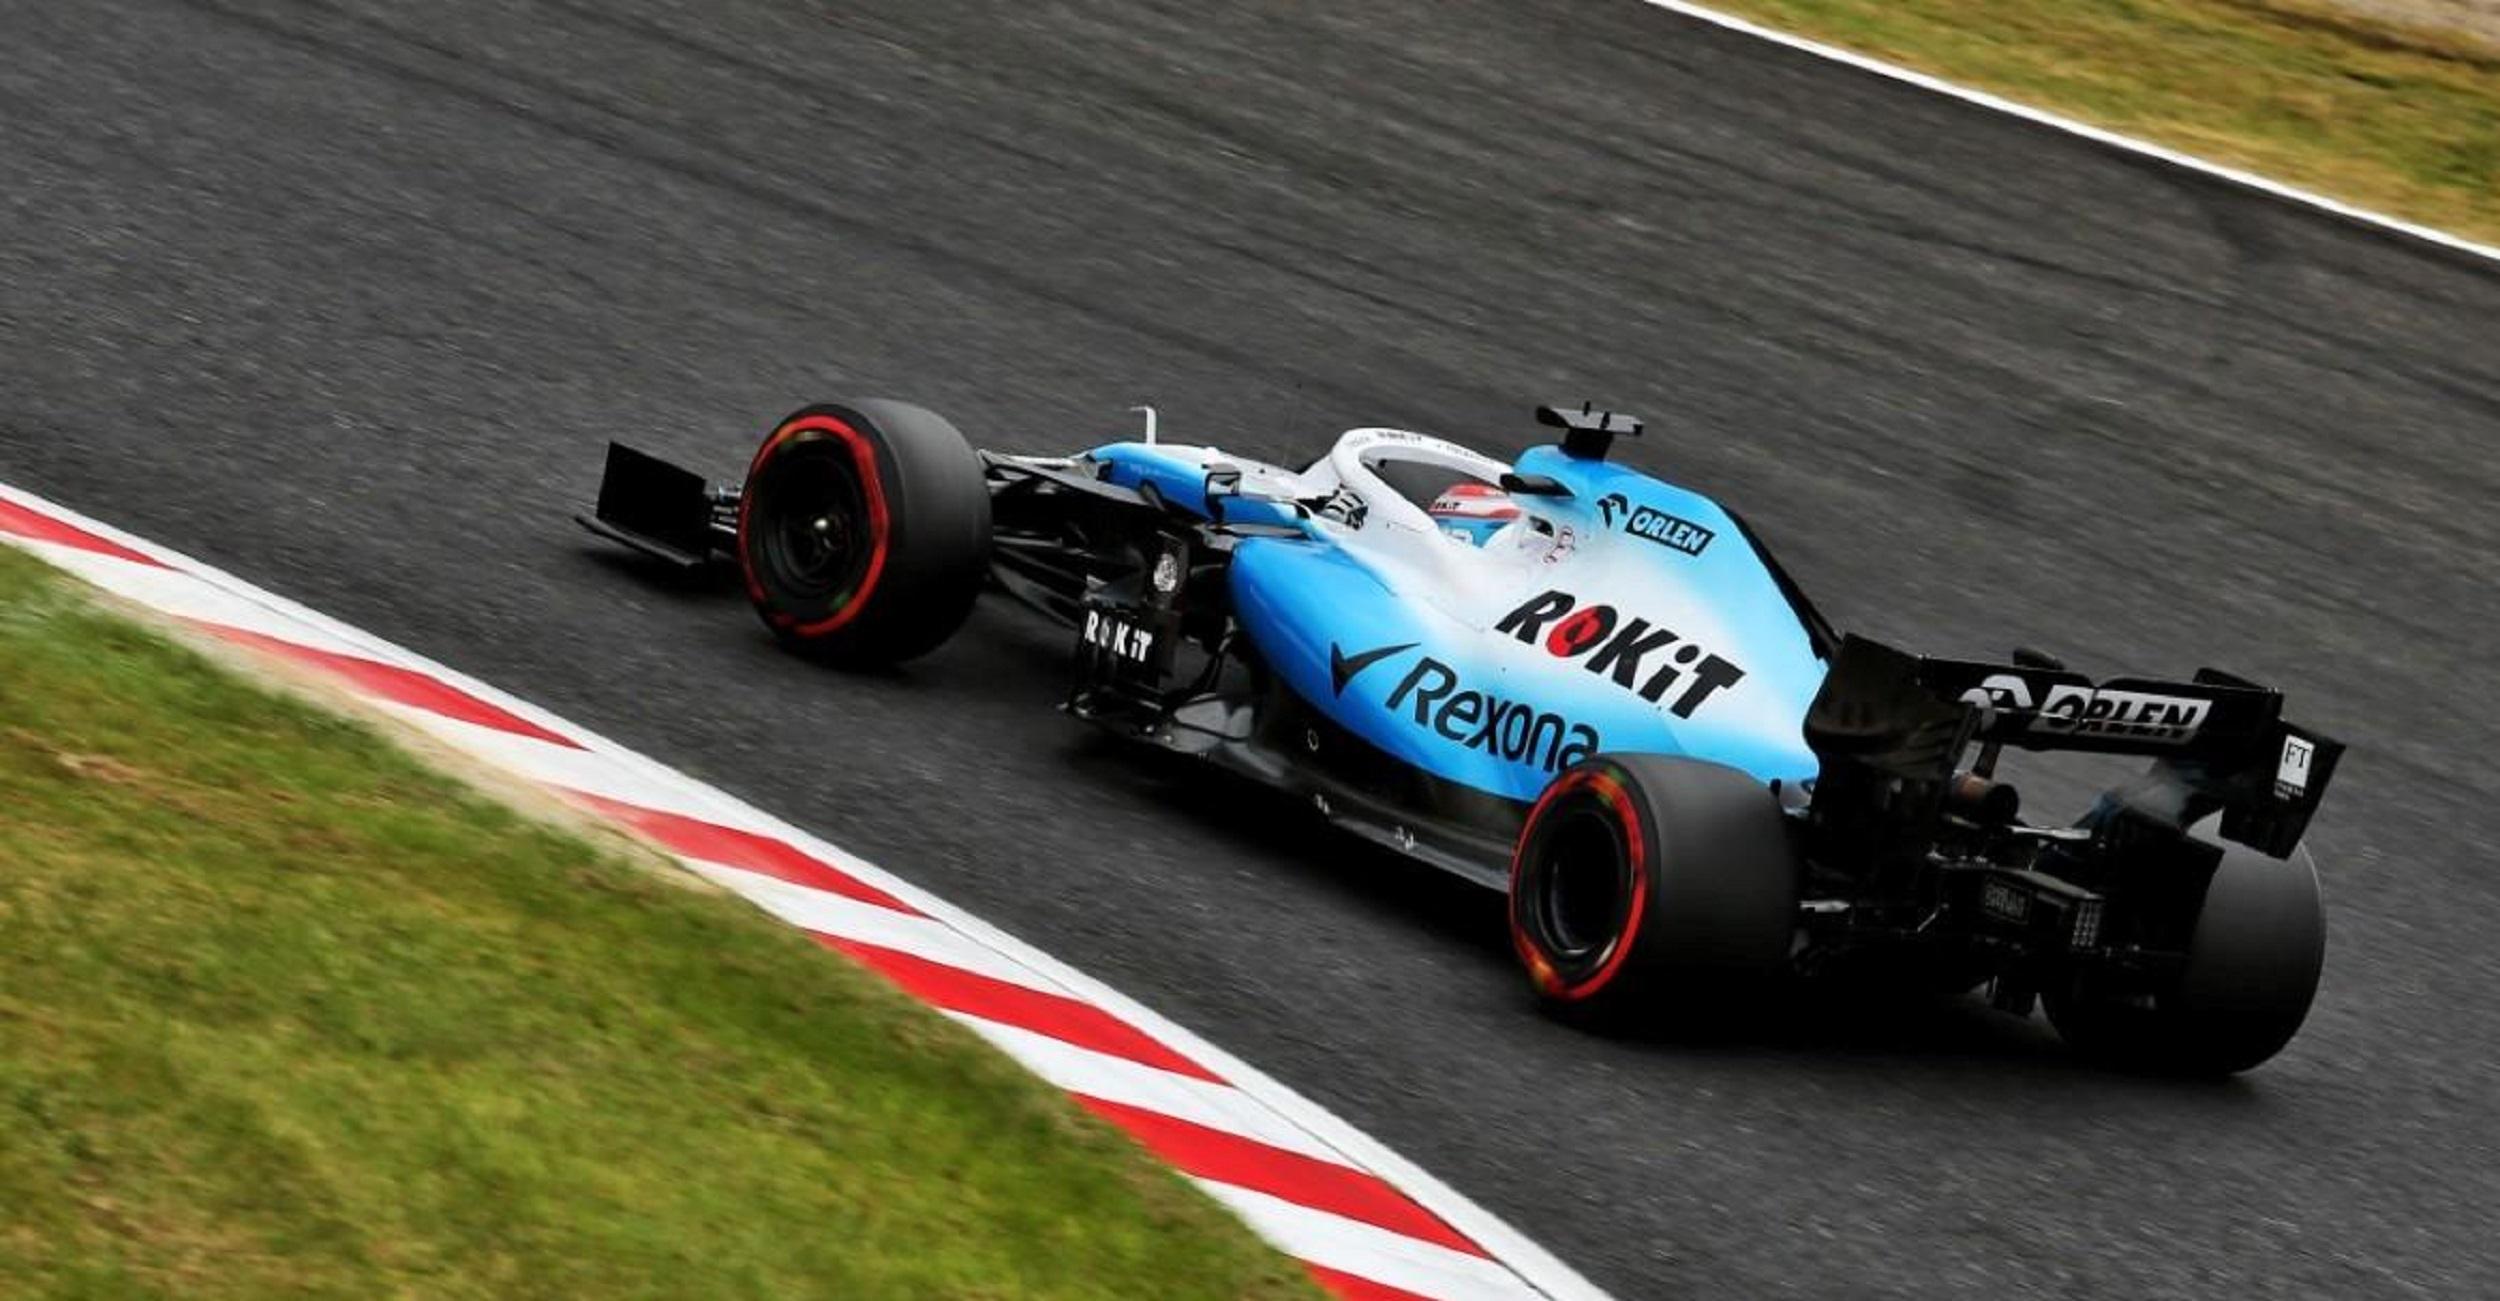 F1 Mendatangkan George Russell adalah Salah Satu Keputusan Terbaik Williams   blackxperience.com